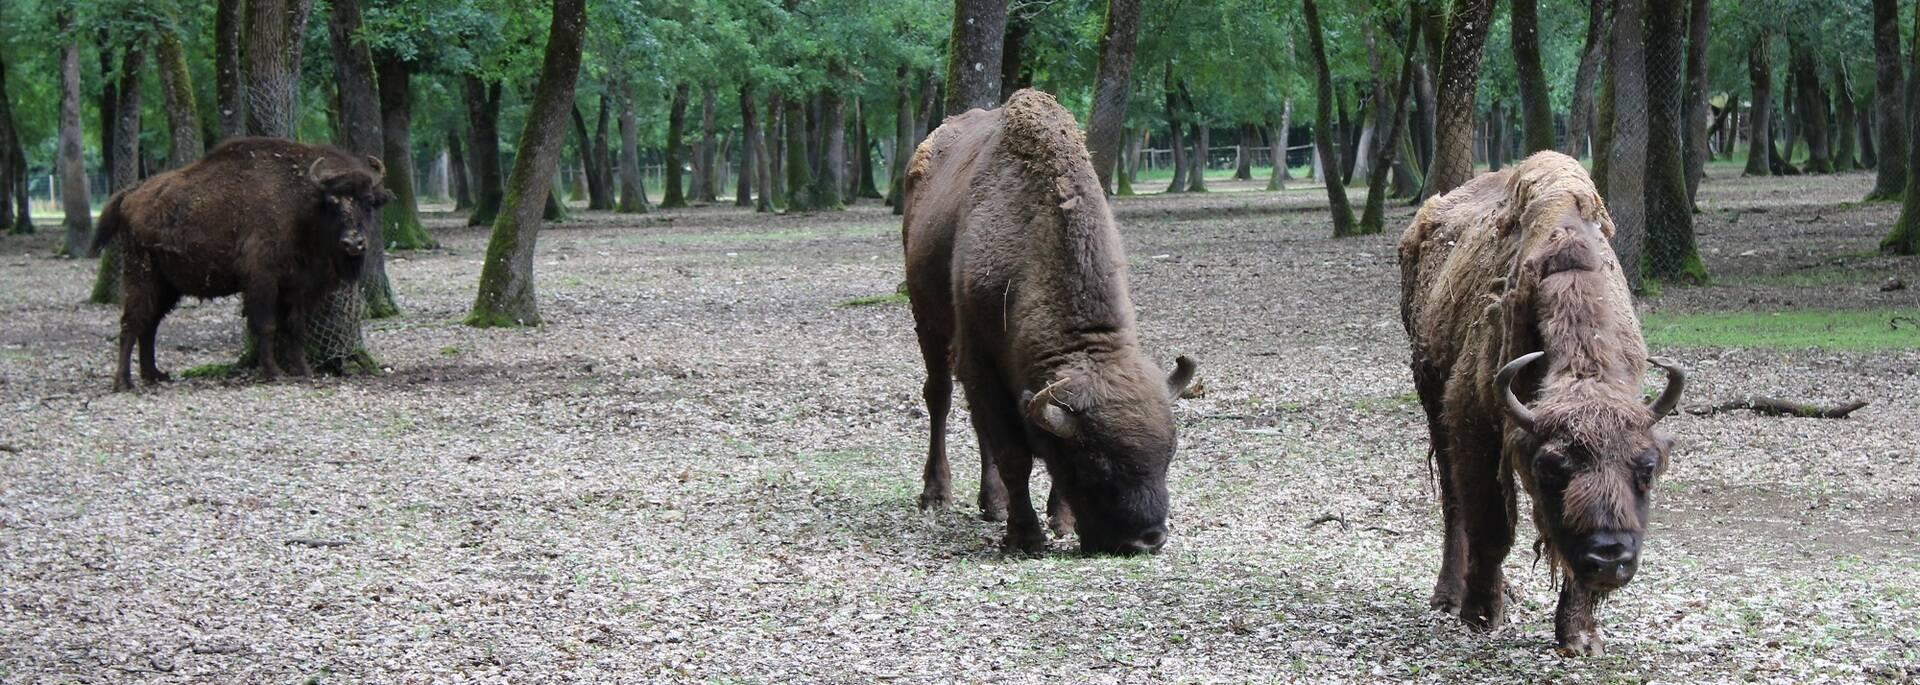 Bisons d'Europe au Zoodyssée - ©P.Migaud / FDHPA17